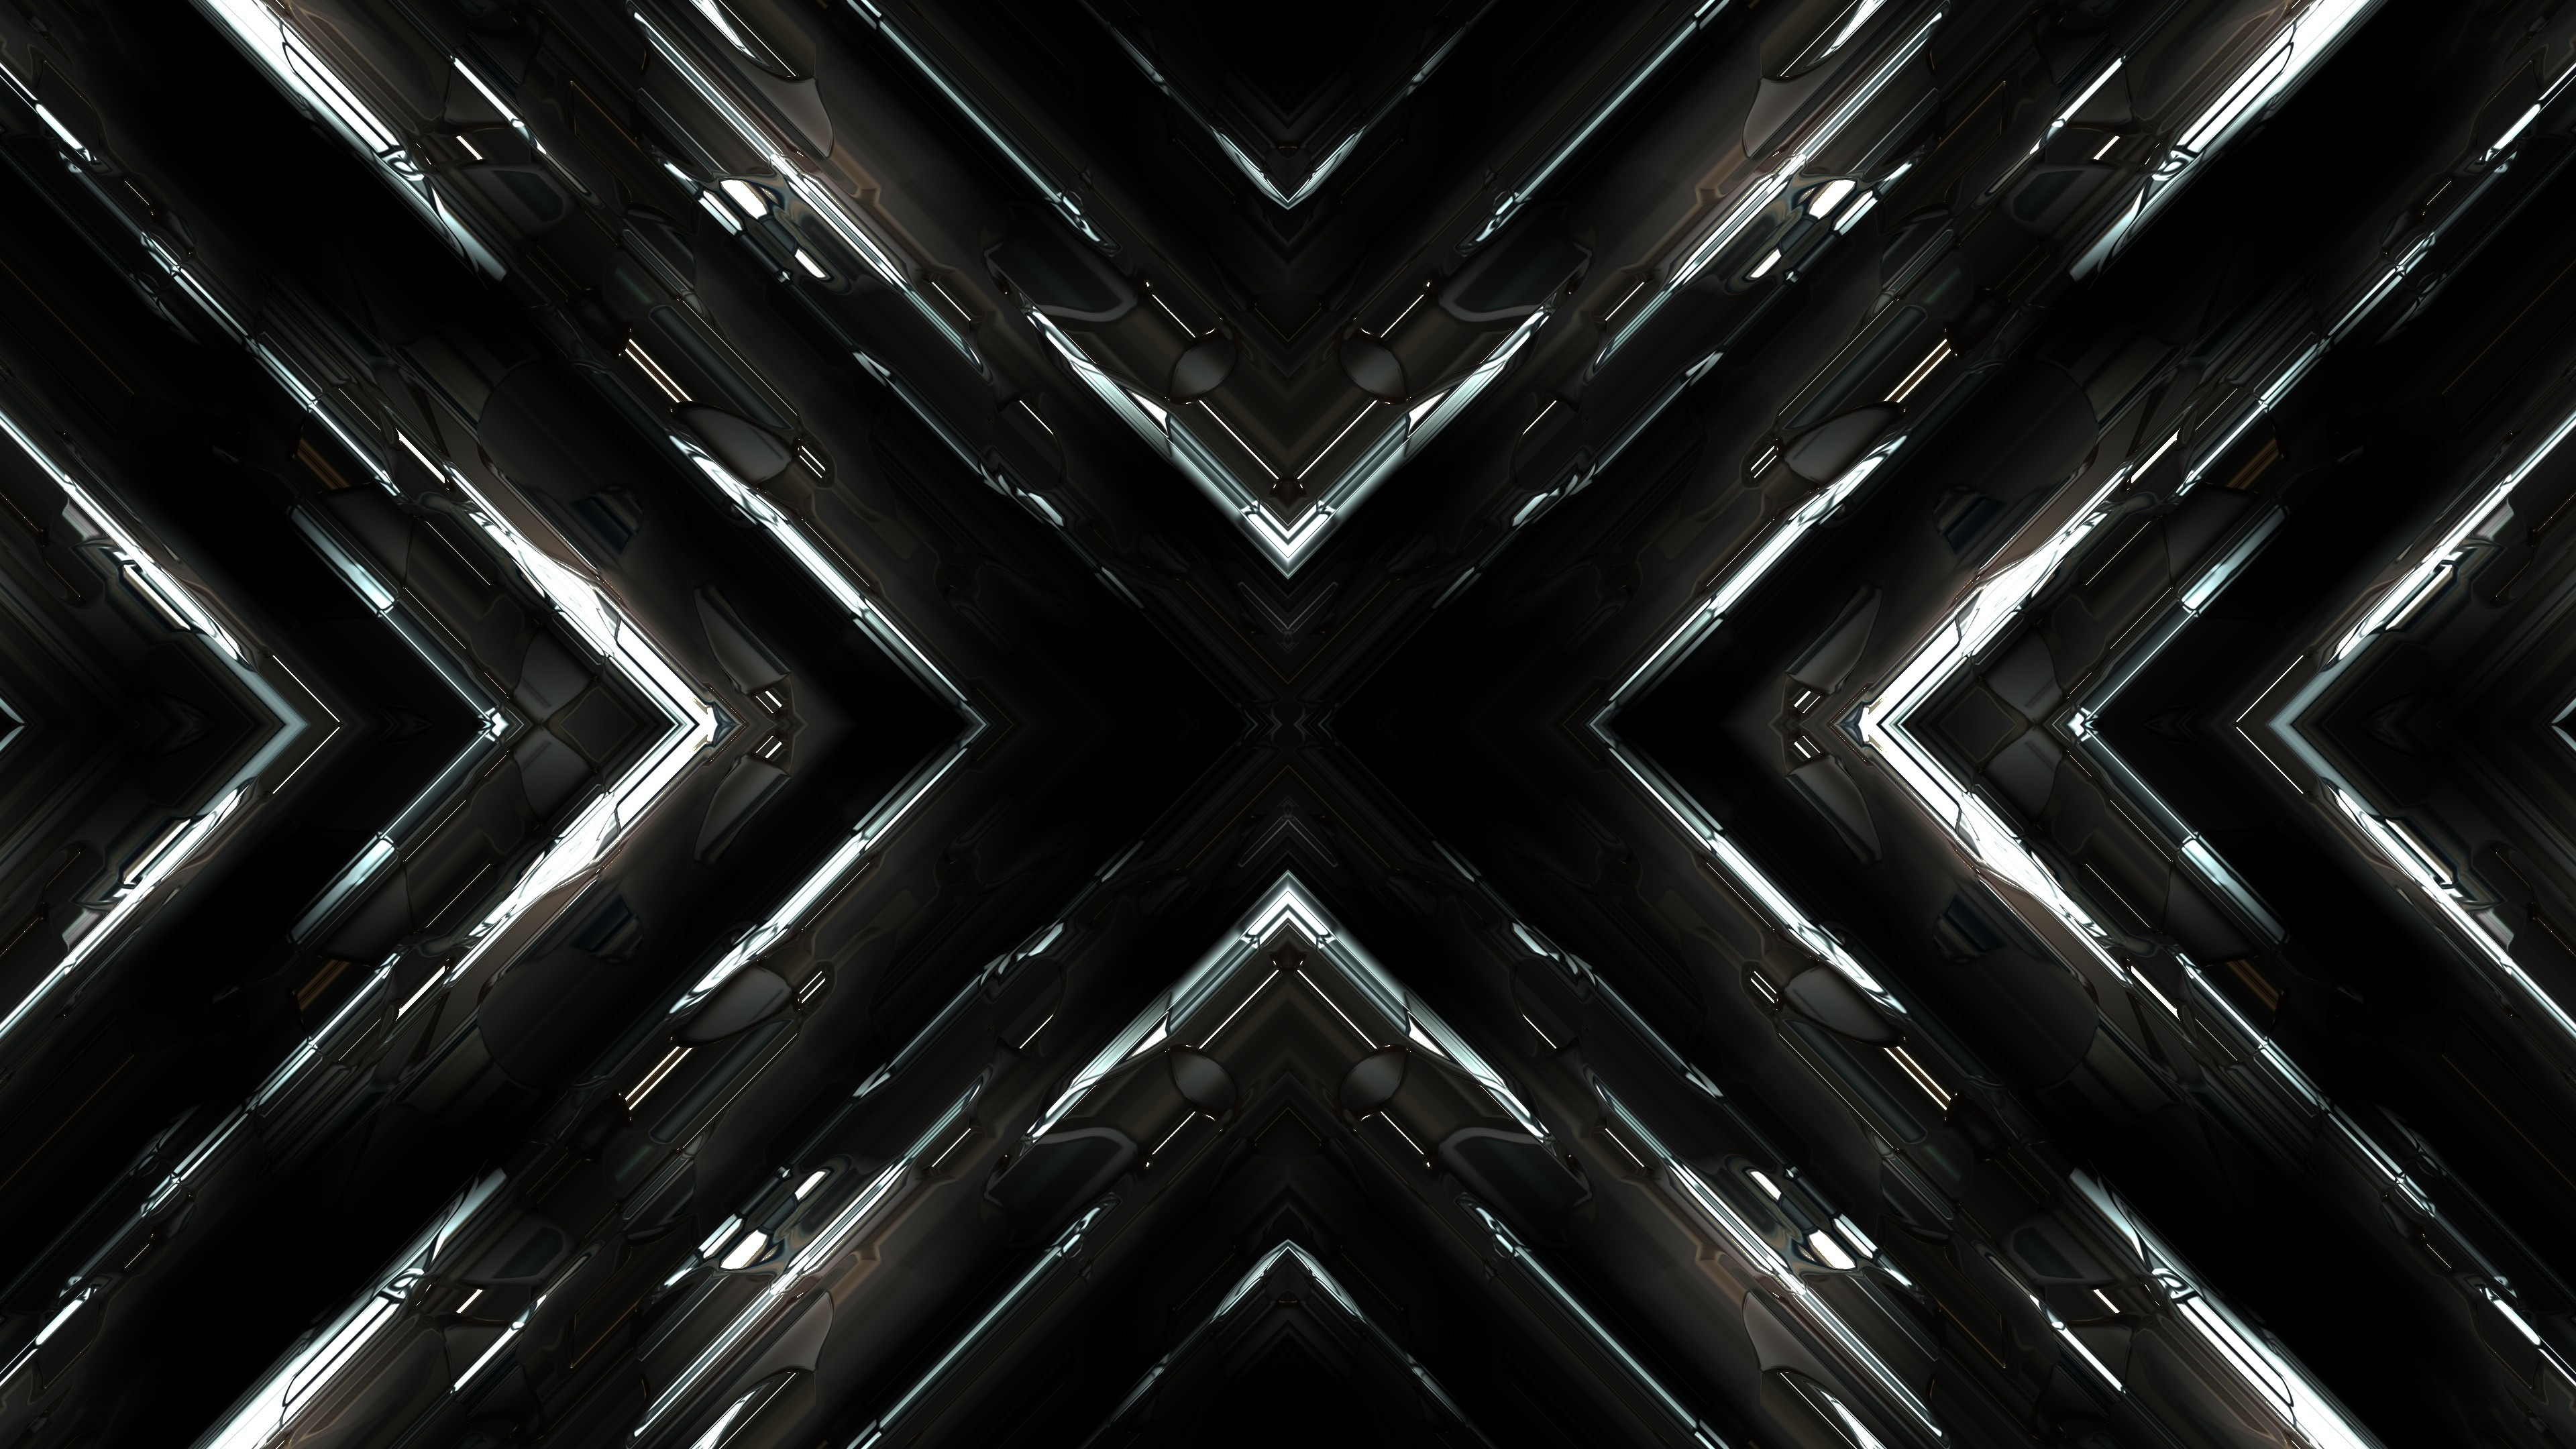 Download 3840x2160 wallpaper fractal, dark, abstract, 4k ...